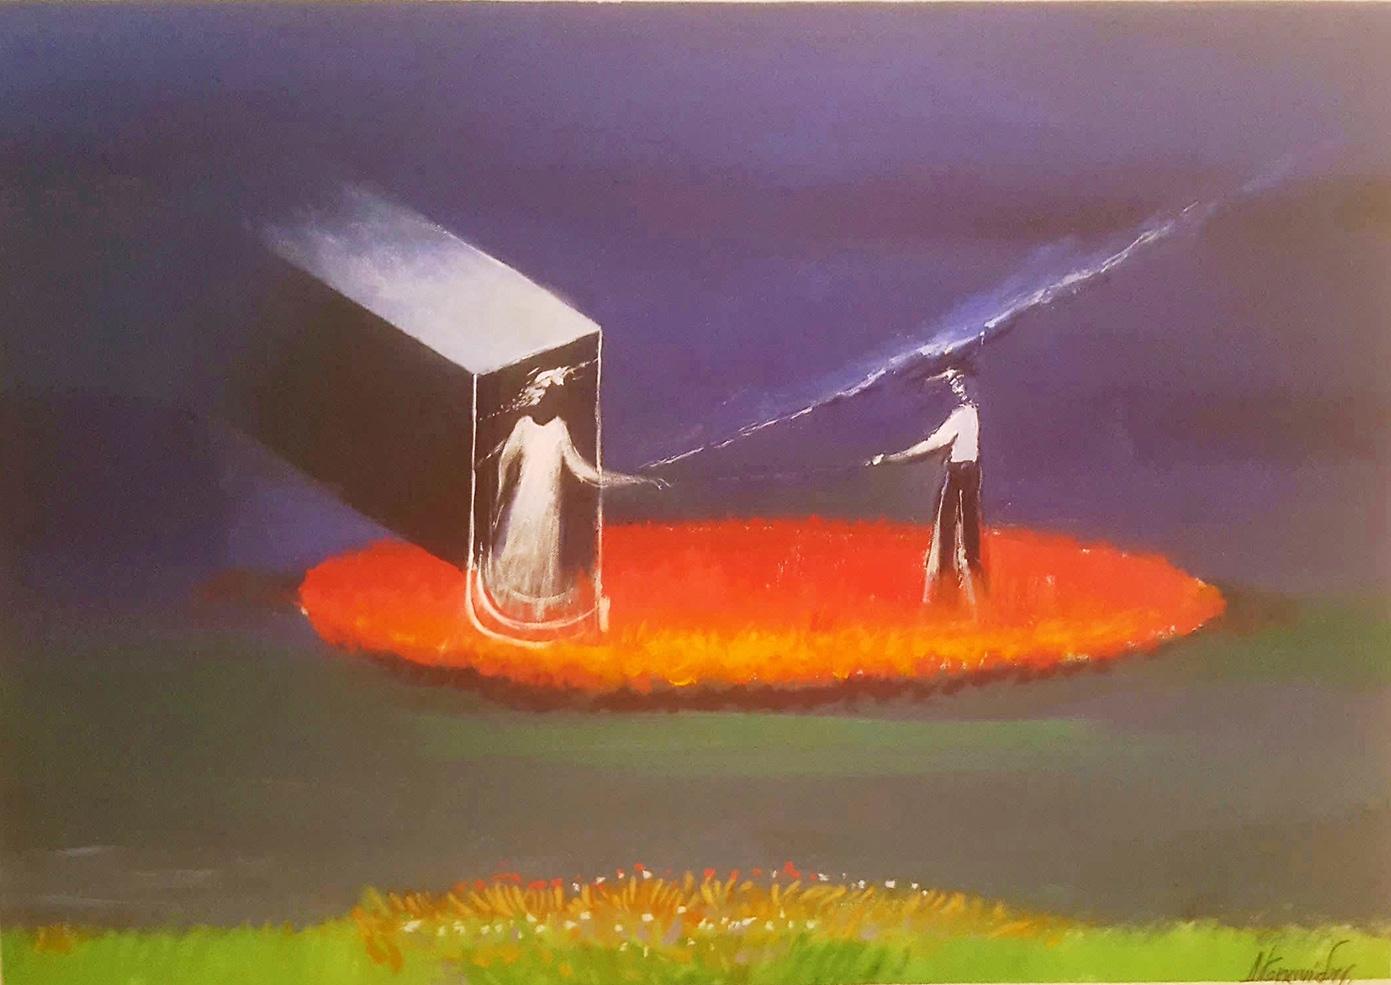 Dimosthenis Kokkinidis, Untitled, acrylics on canvas, 104 x 74 cm